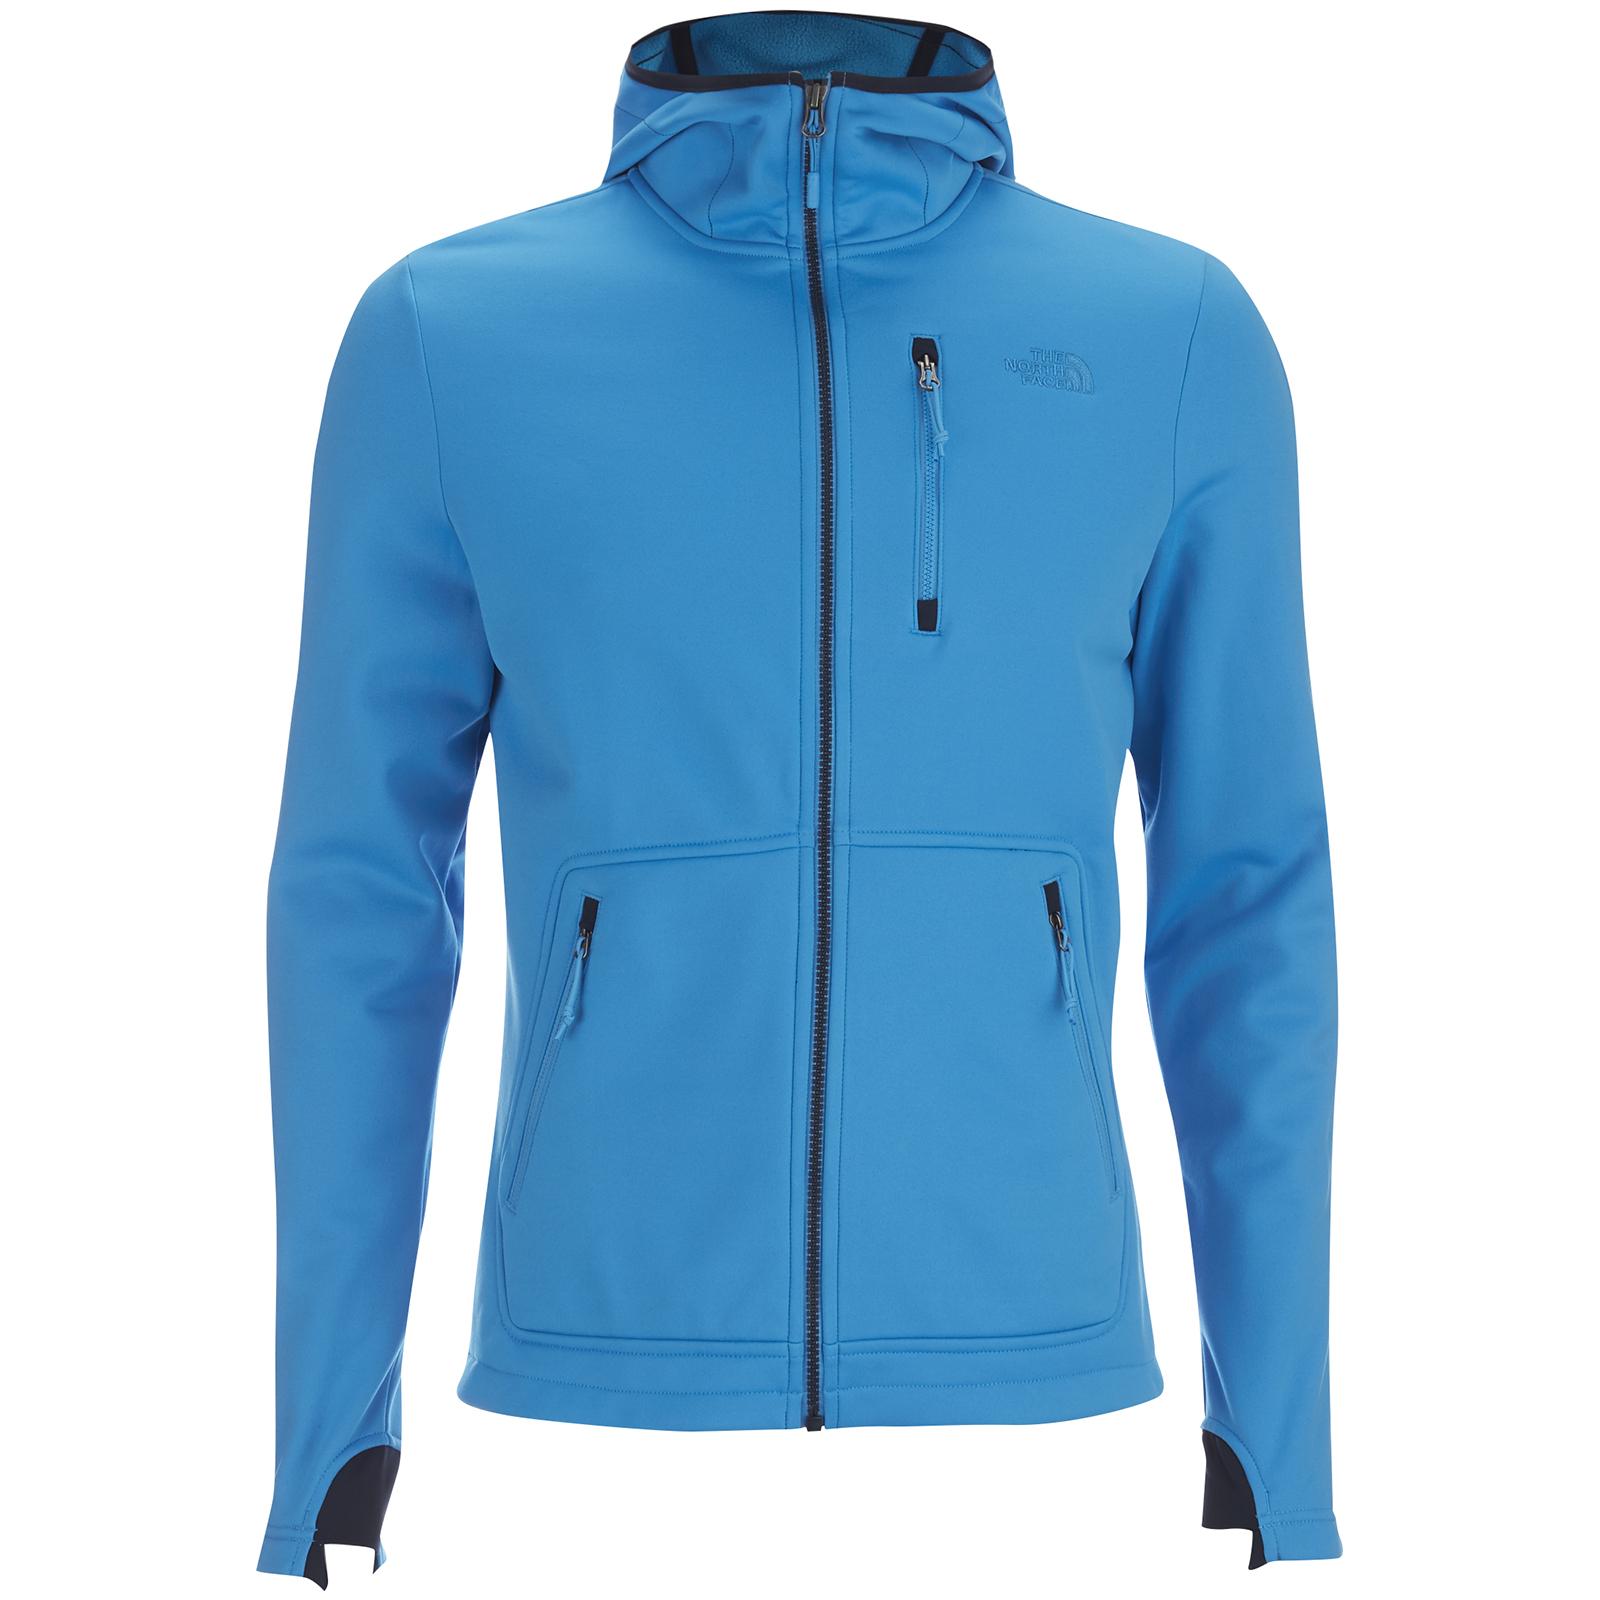 e687a9f8c The North Face Men's Rafford Full Zip Hoody - Blue Aster